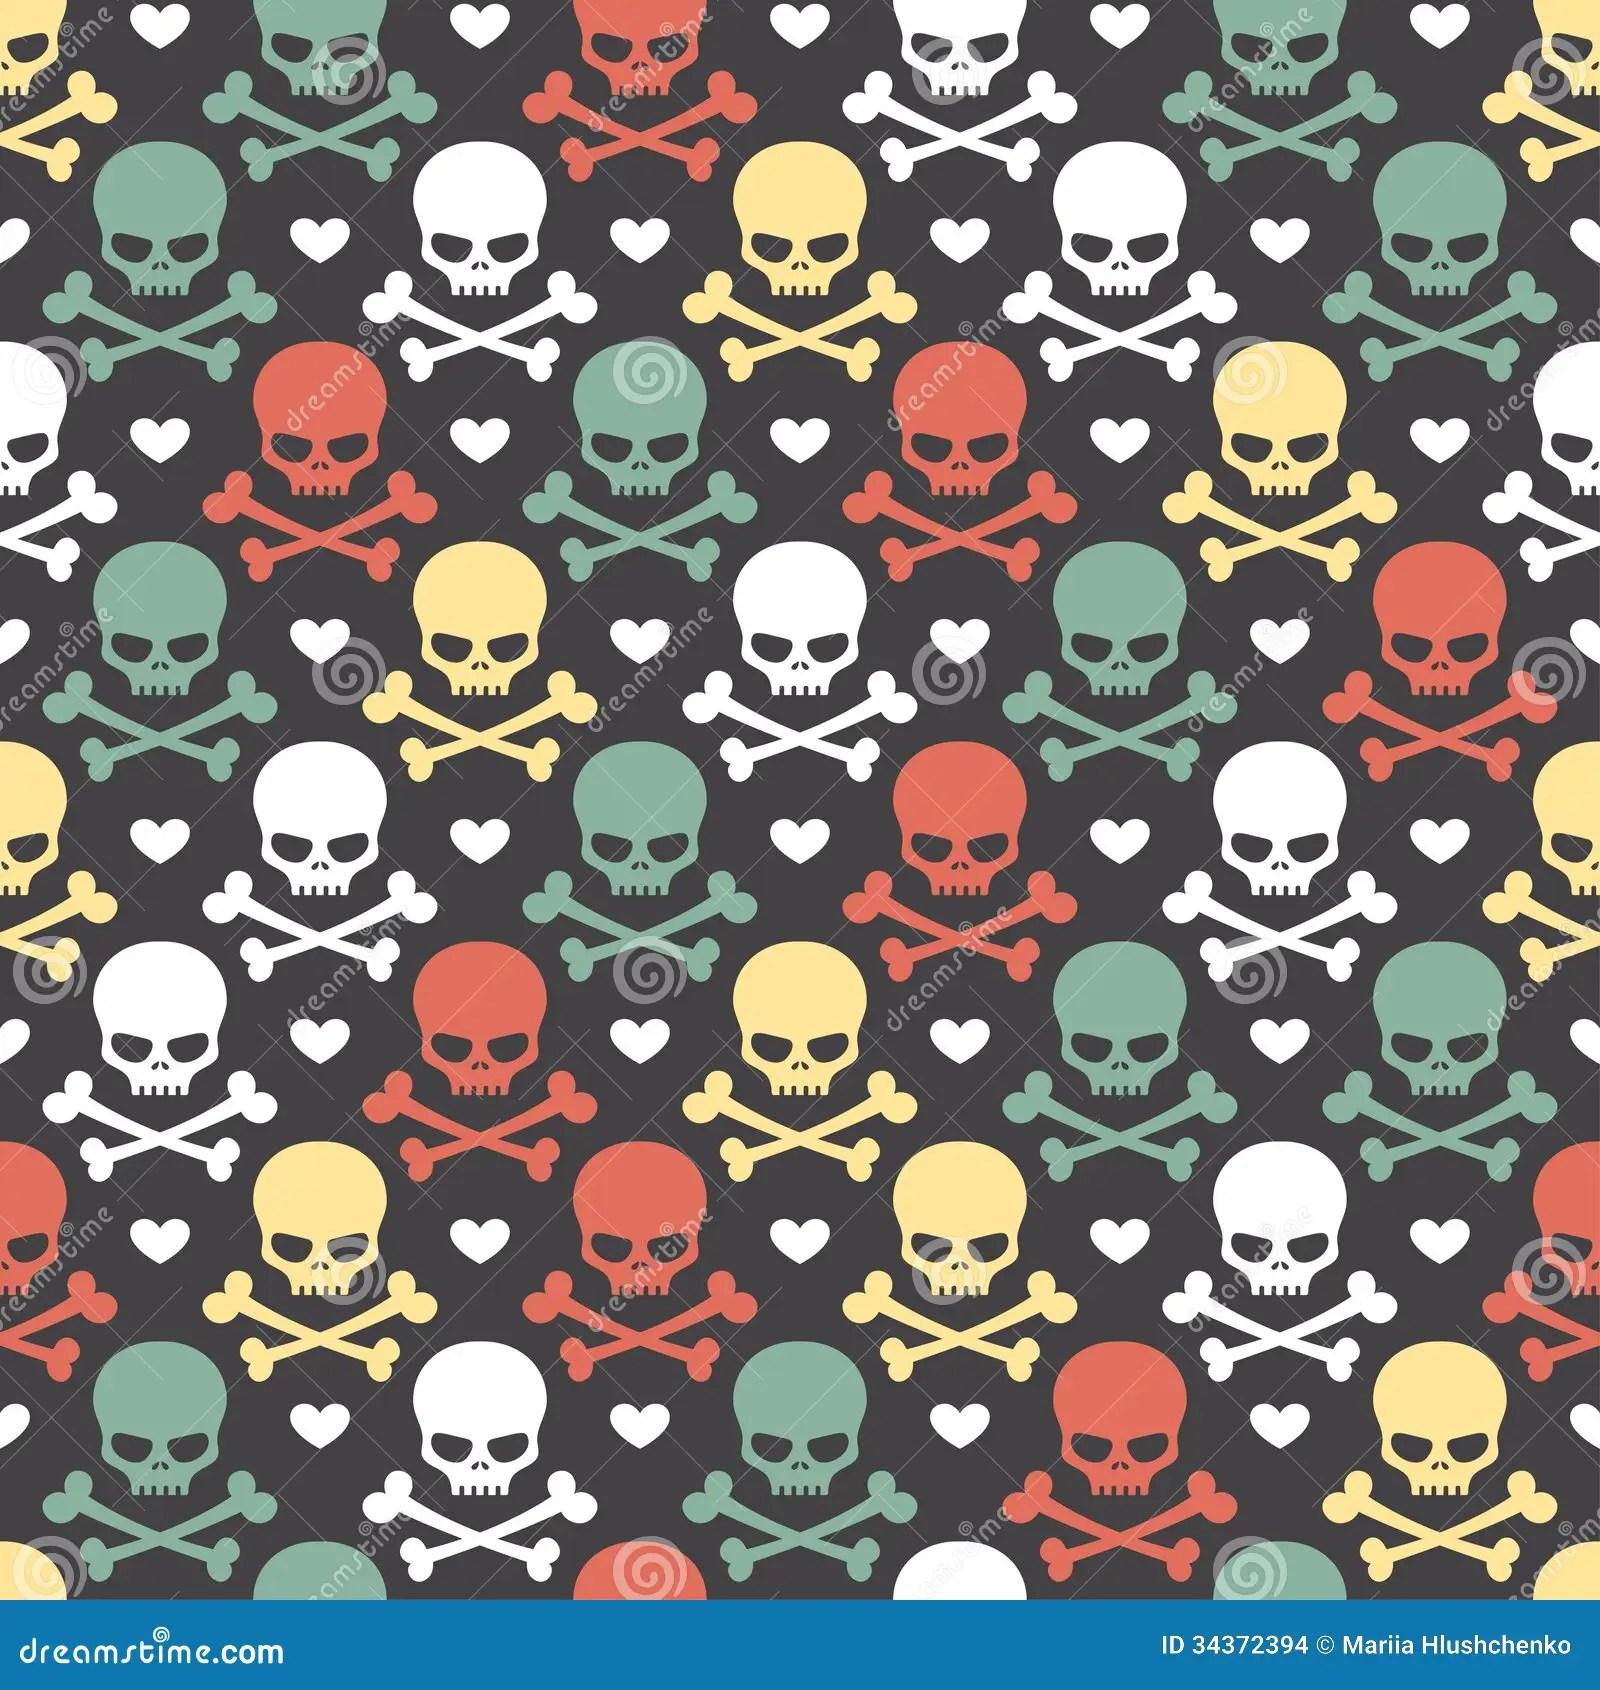 Skeleton Pattern Wallpaper Cute Skull Seamless Pattern Stock Vector Illustration Of Death